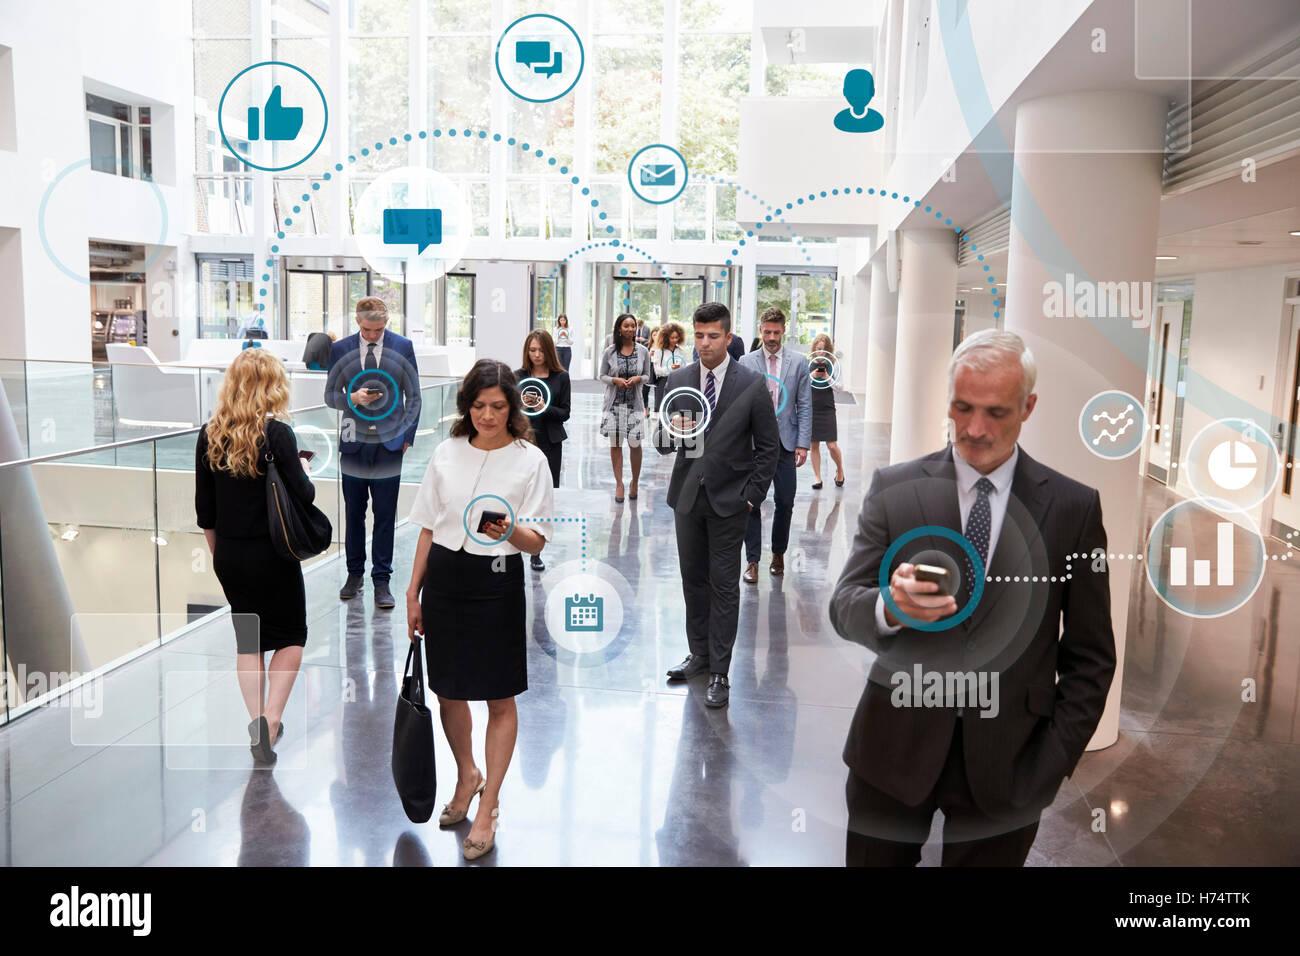 Business Men And Women Using Digital Technology - Stock Image